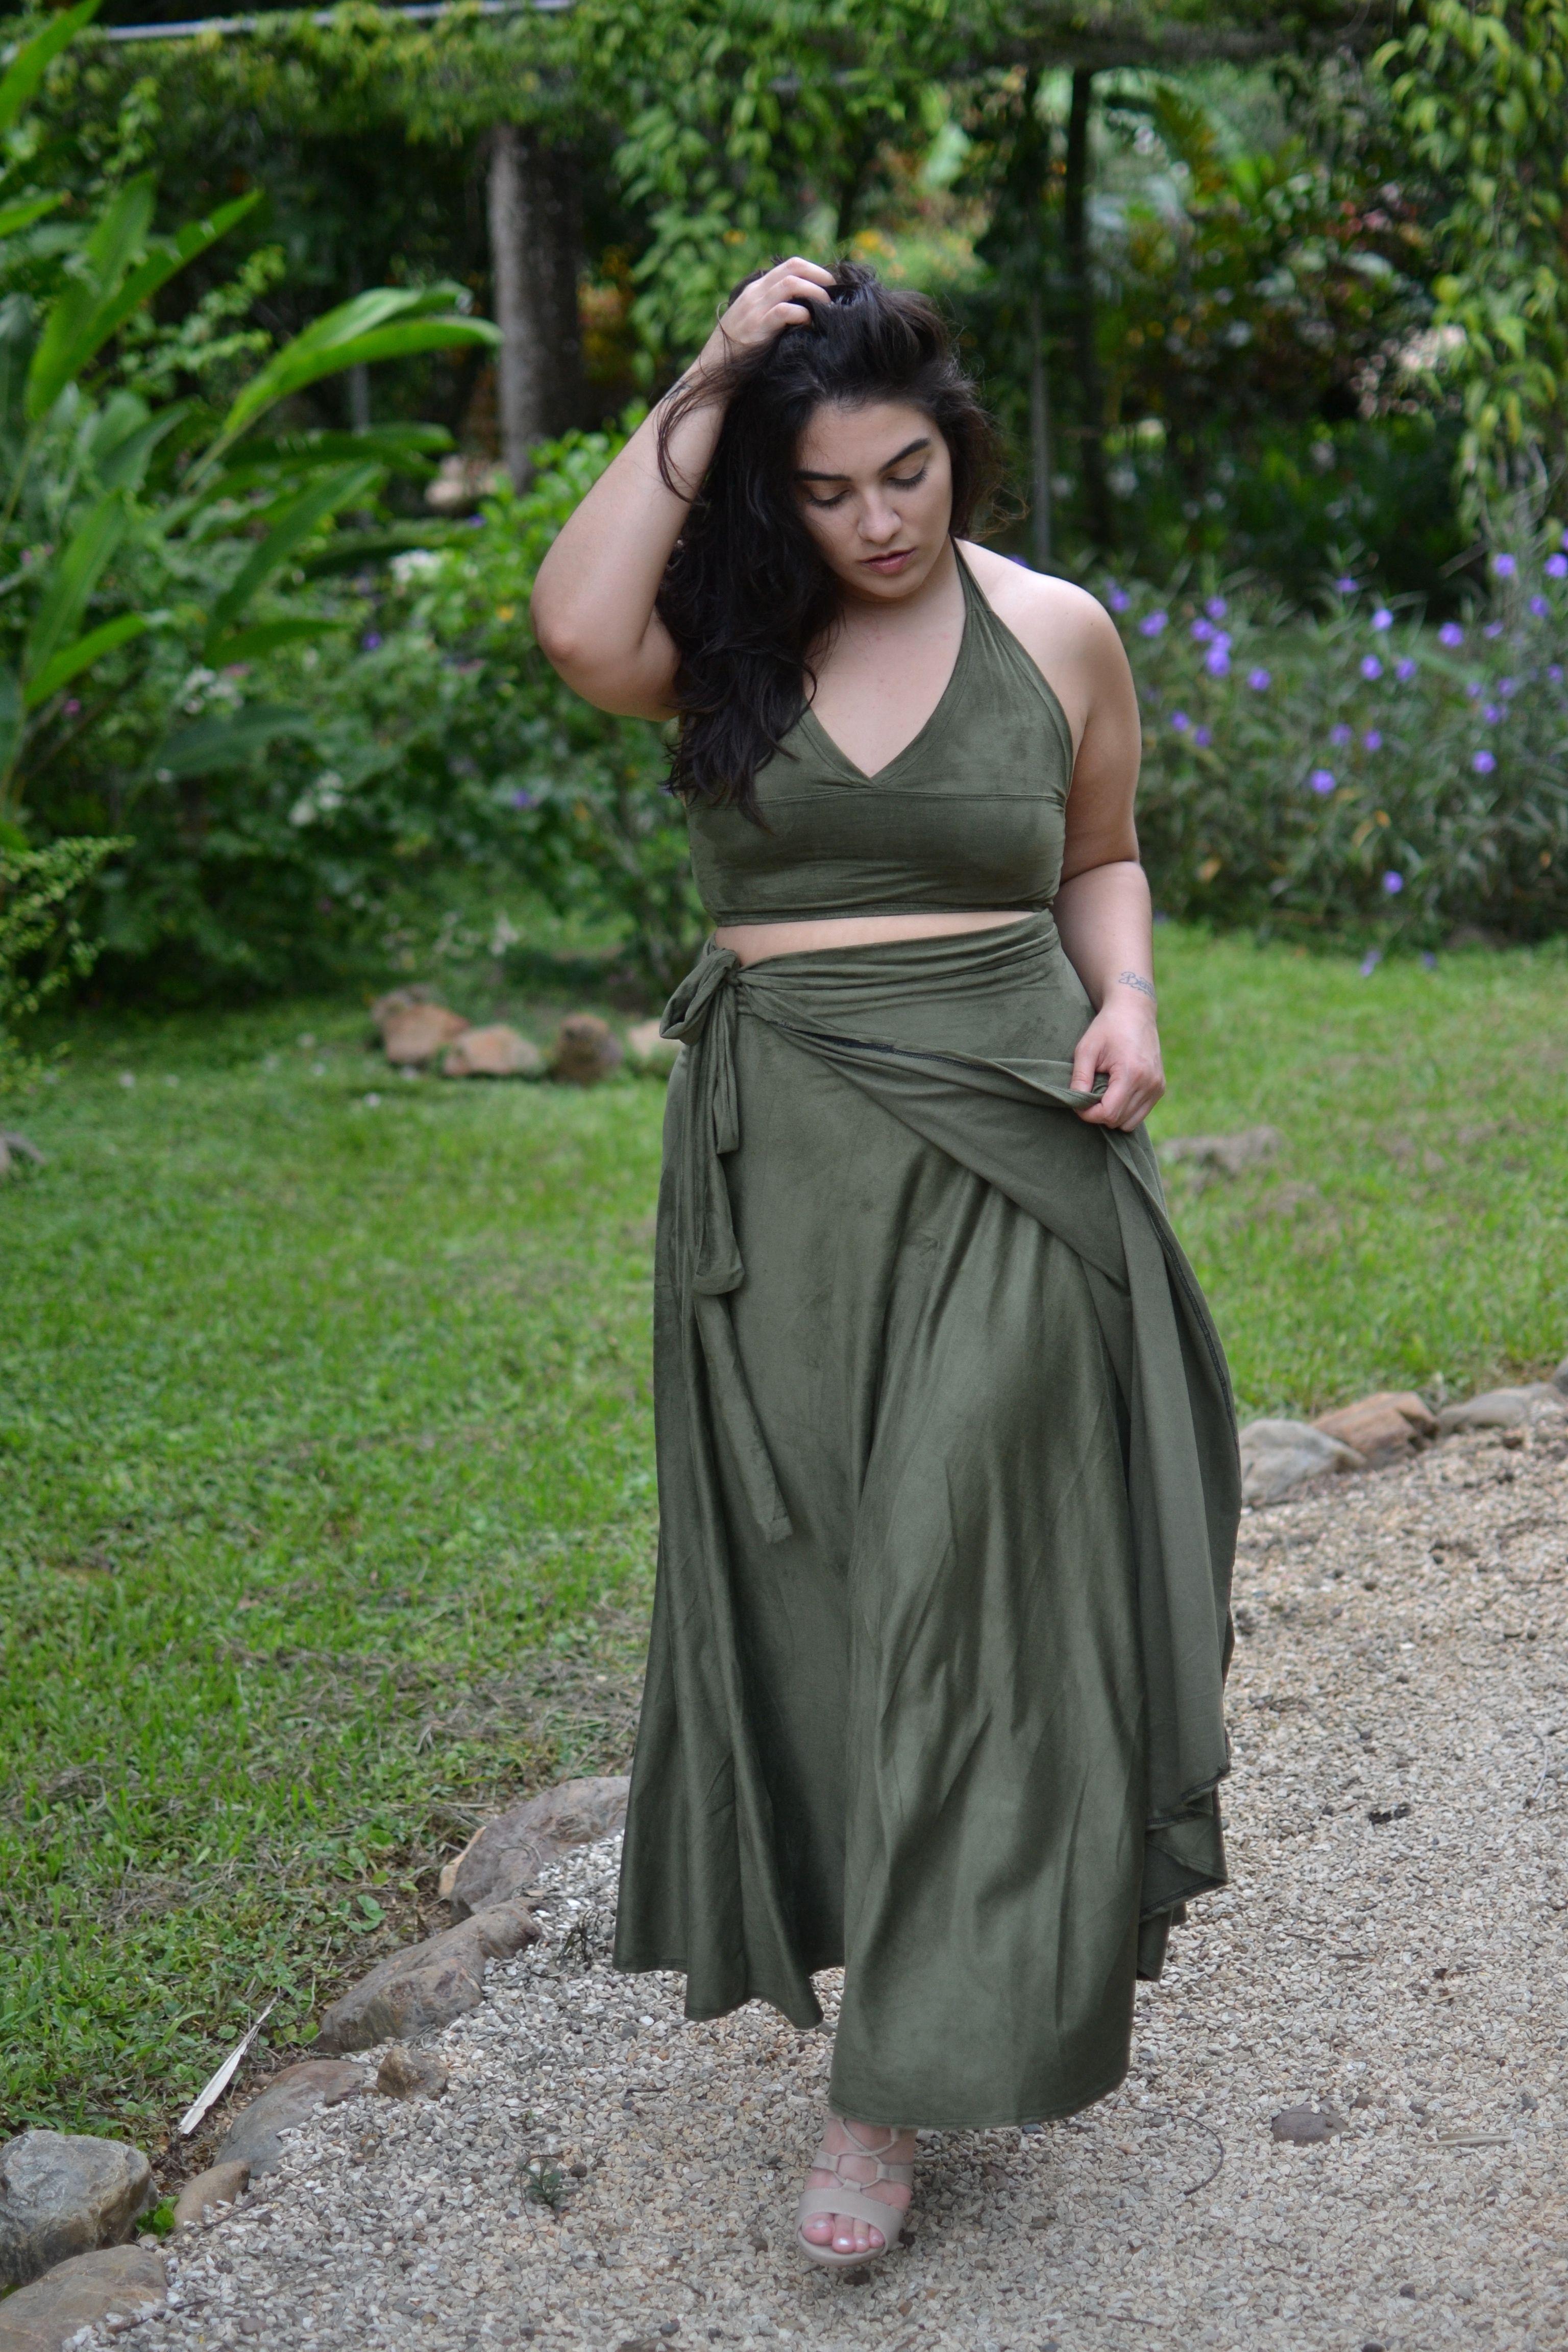 Olive Green 2 Piece Curvy Plus Size Fashion Pinterest Nadia